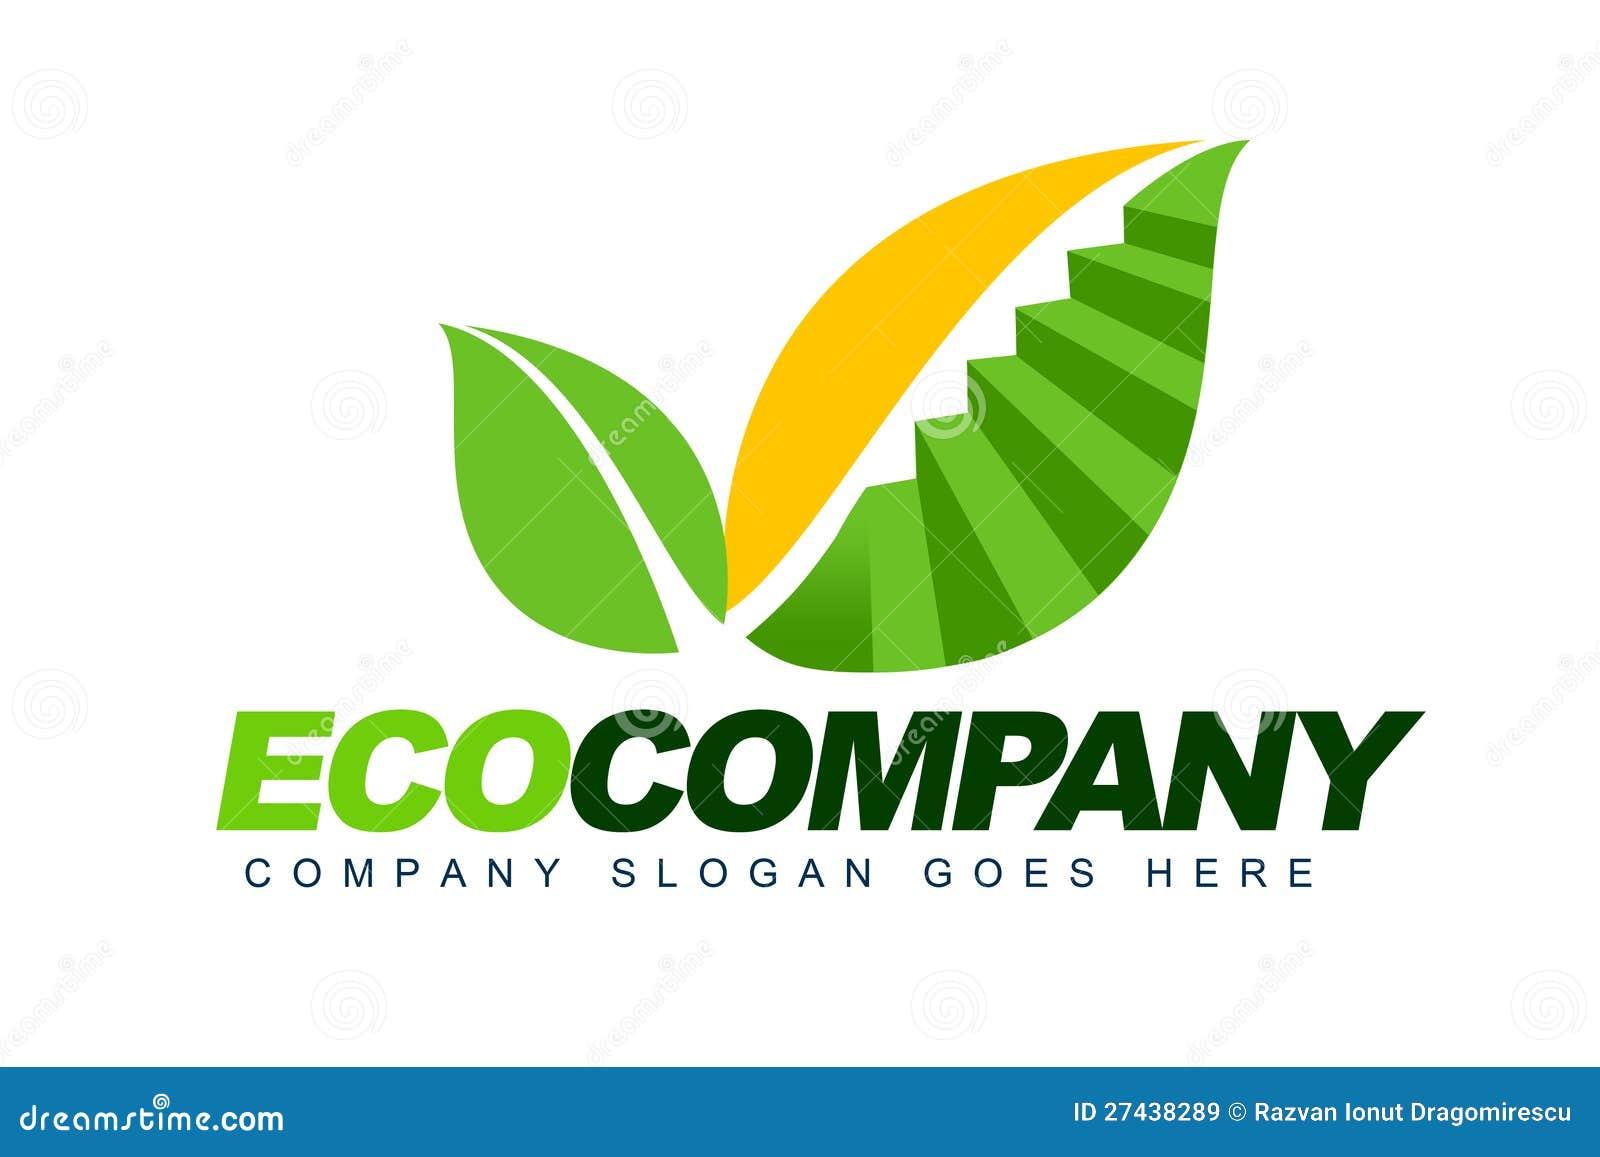 Eco Company Logo Royalty Free Stock Images Image 27438289